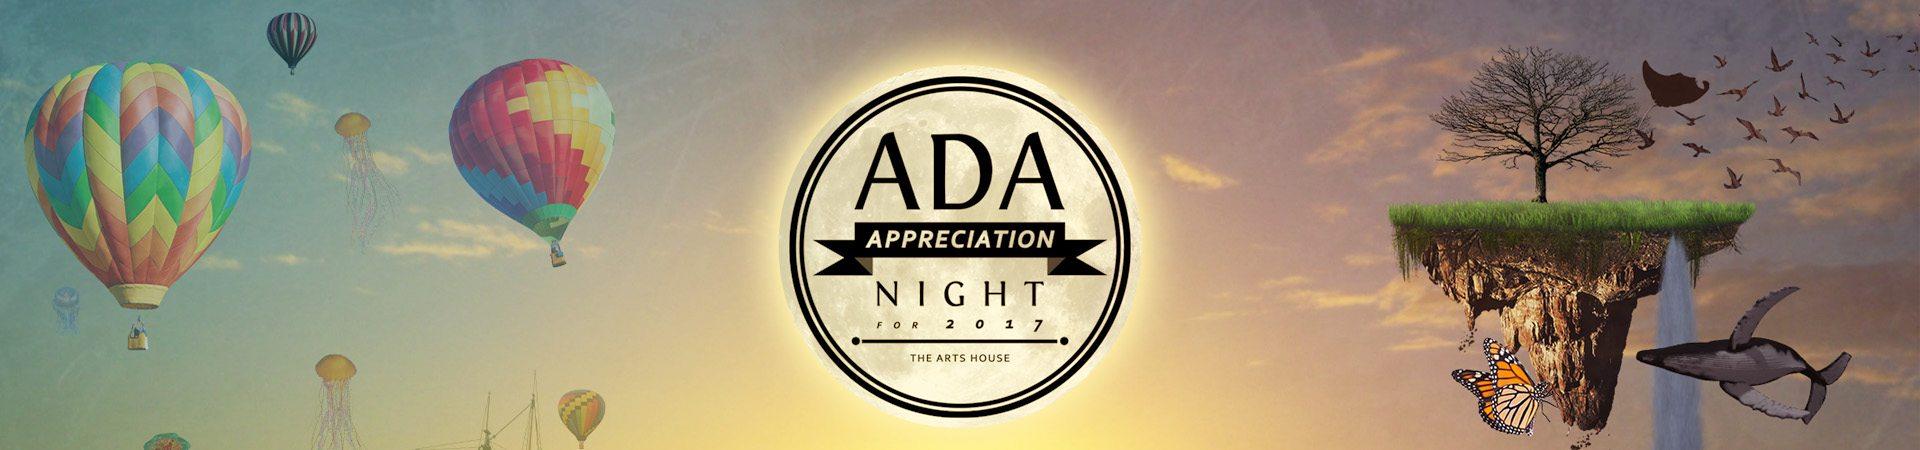 ADA Web header banner